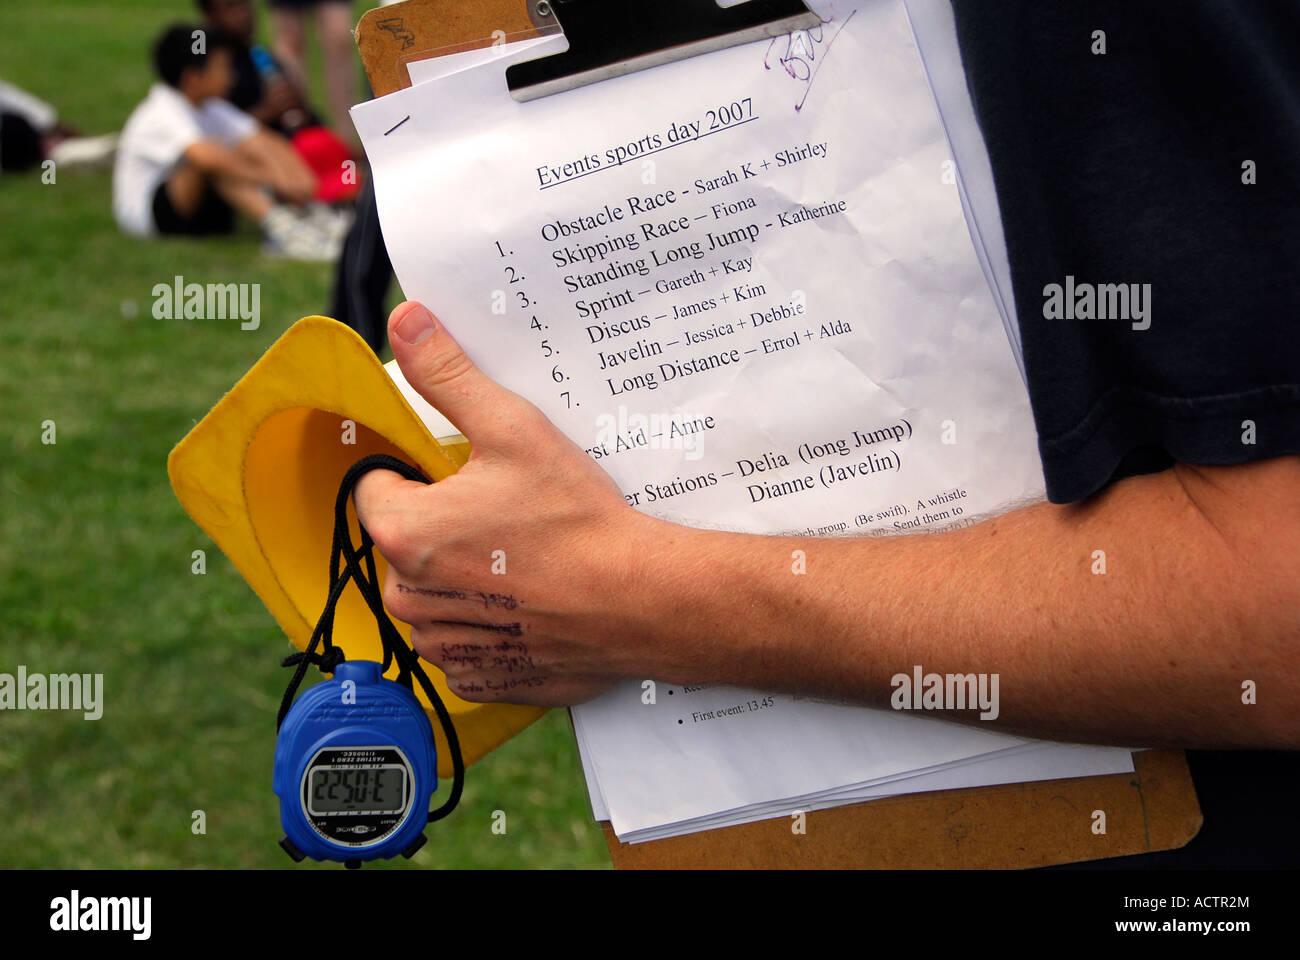 SPORT TEACHER HOLDONG ACTIVITY SHEET AND CHRONOMETER - Stock Image